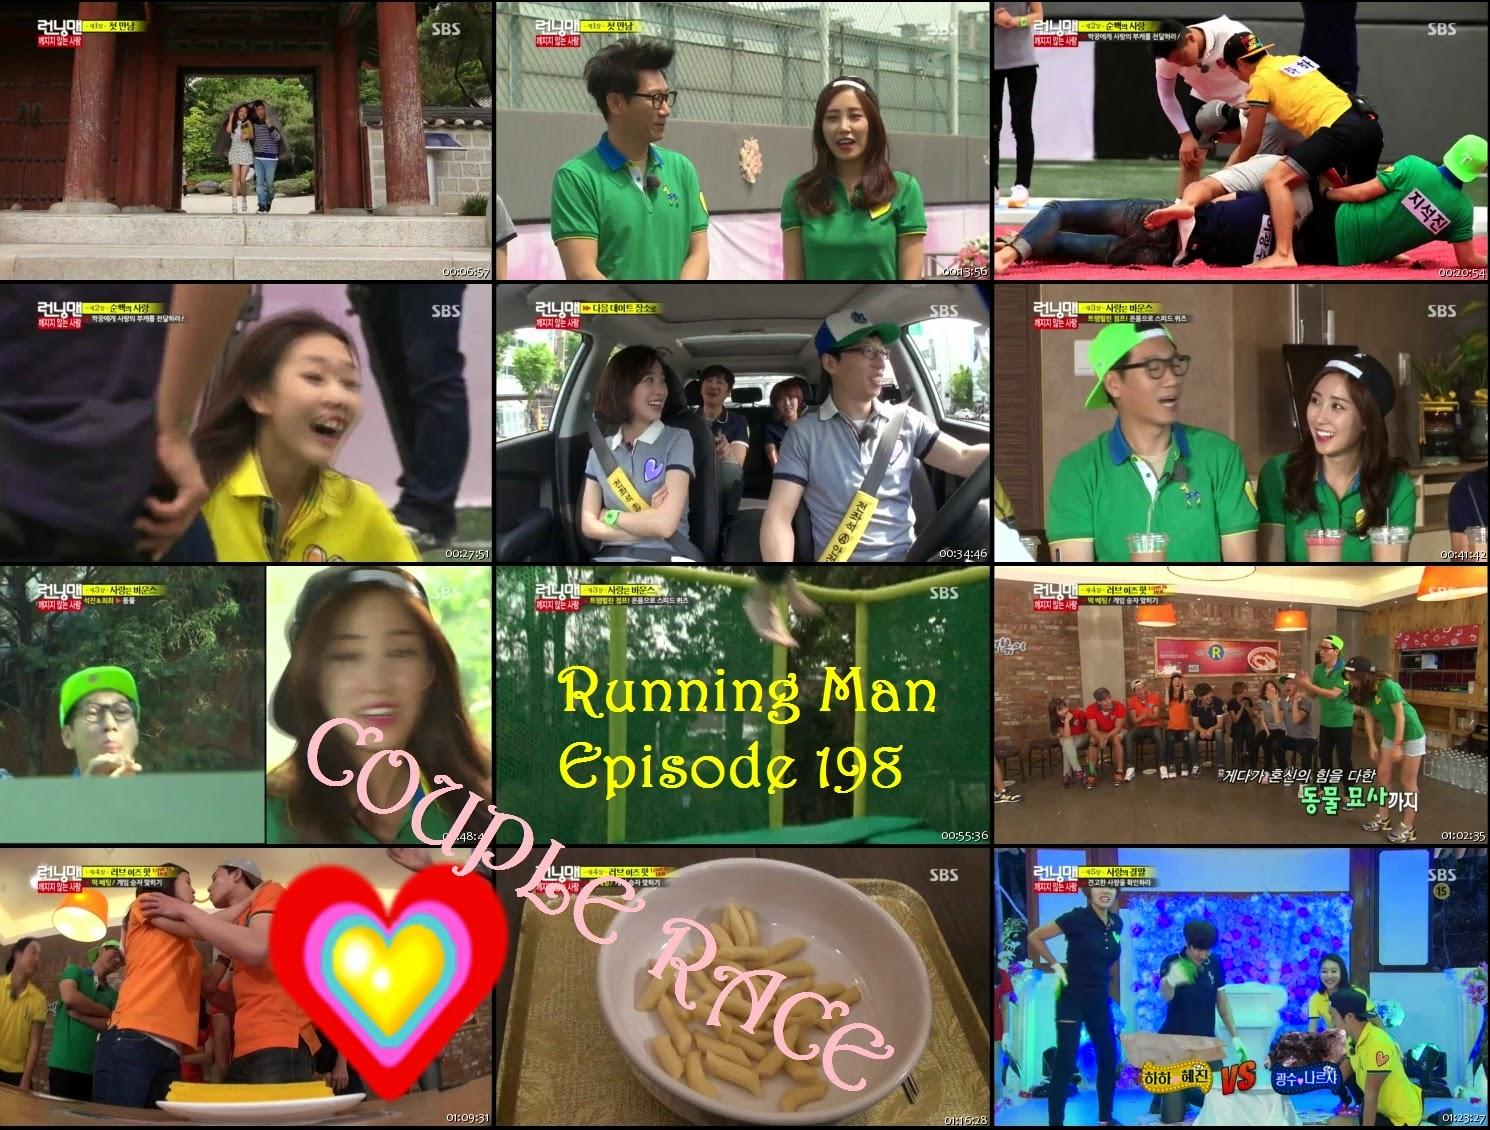 Running Man Episode 198 English Sub Full - Asianfanfics